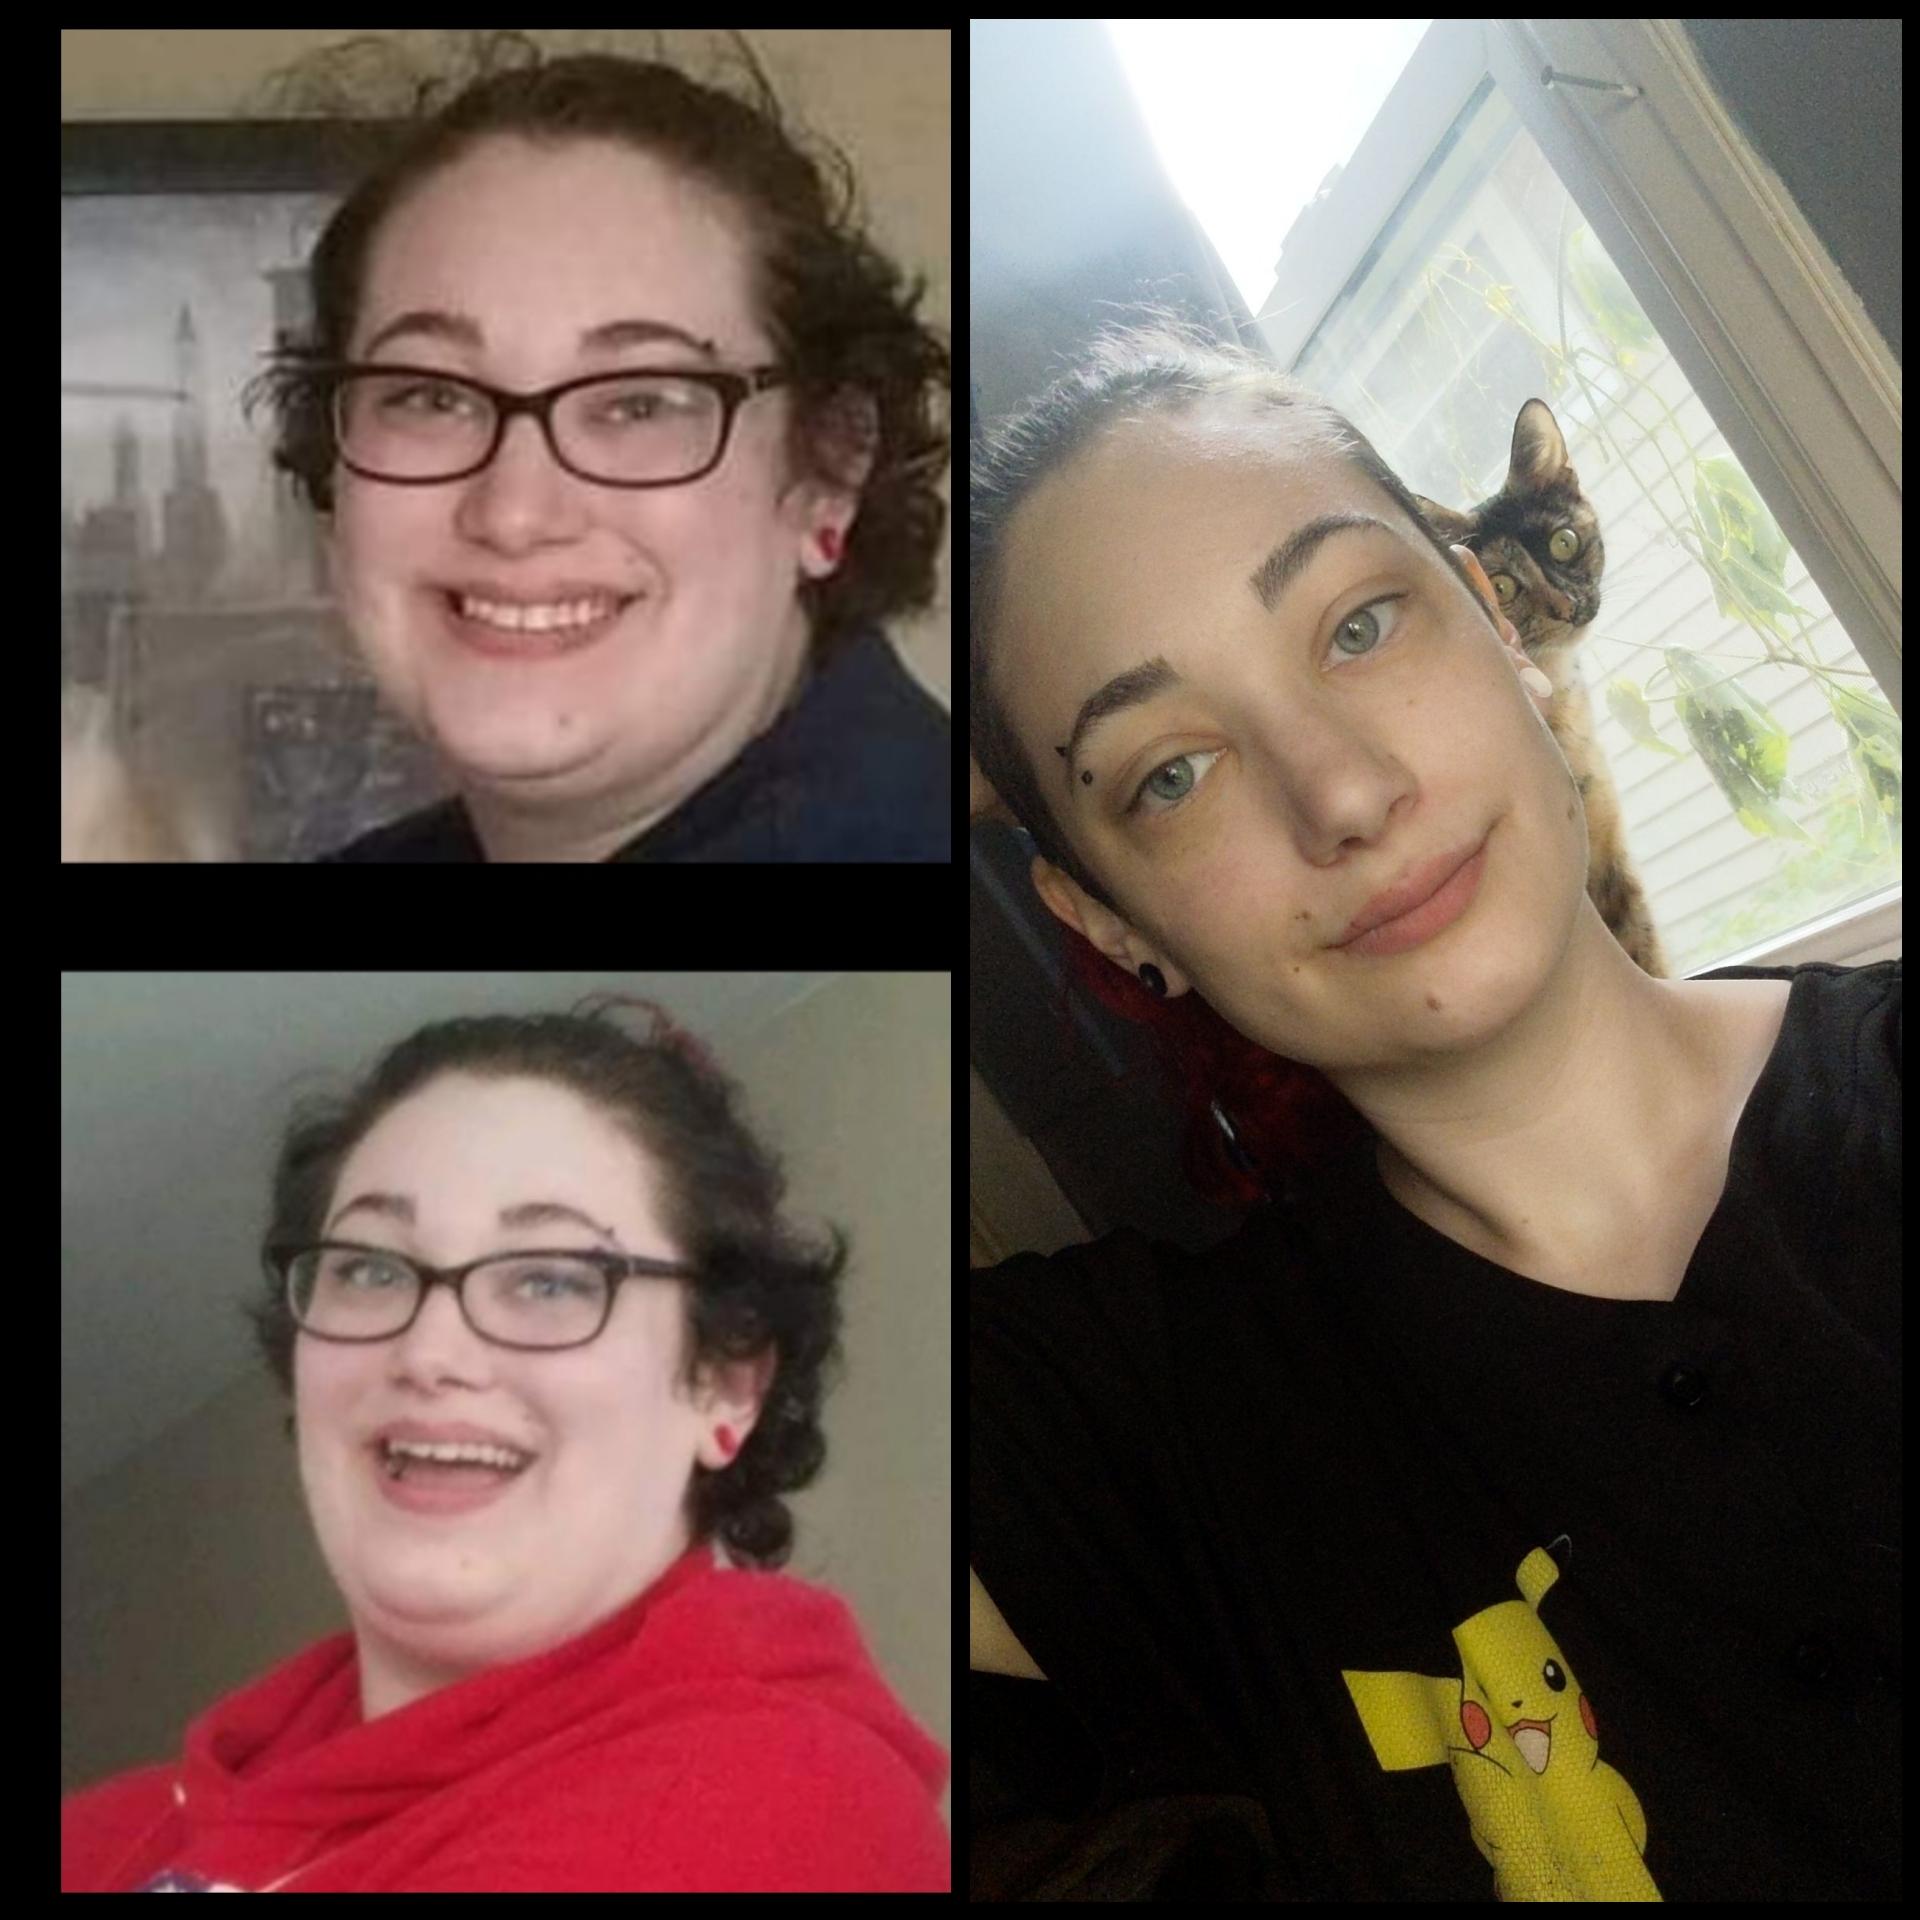 5 foot 9 Female Progress Pics of 87 lbs Weight Loss 270 lbs to 183 lbs